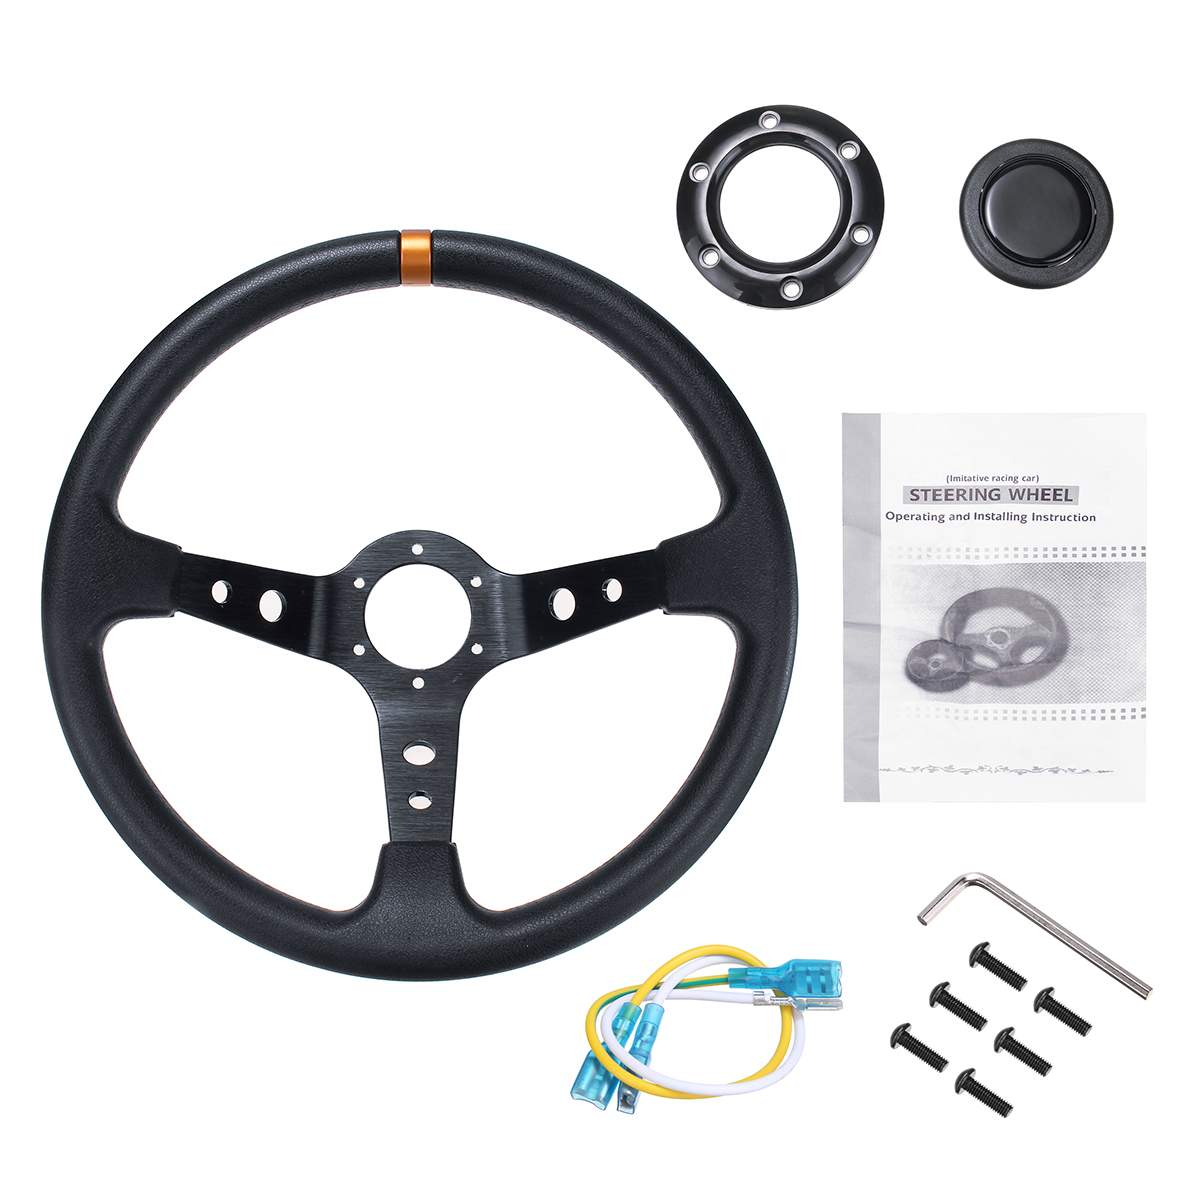 Universele 350 Mm 14 Inch Pu & Aluminium Stuurwiel Auto Sport Racing Steering Wheel Drifting Deep Dish Corn